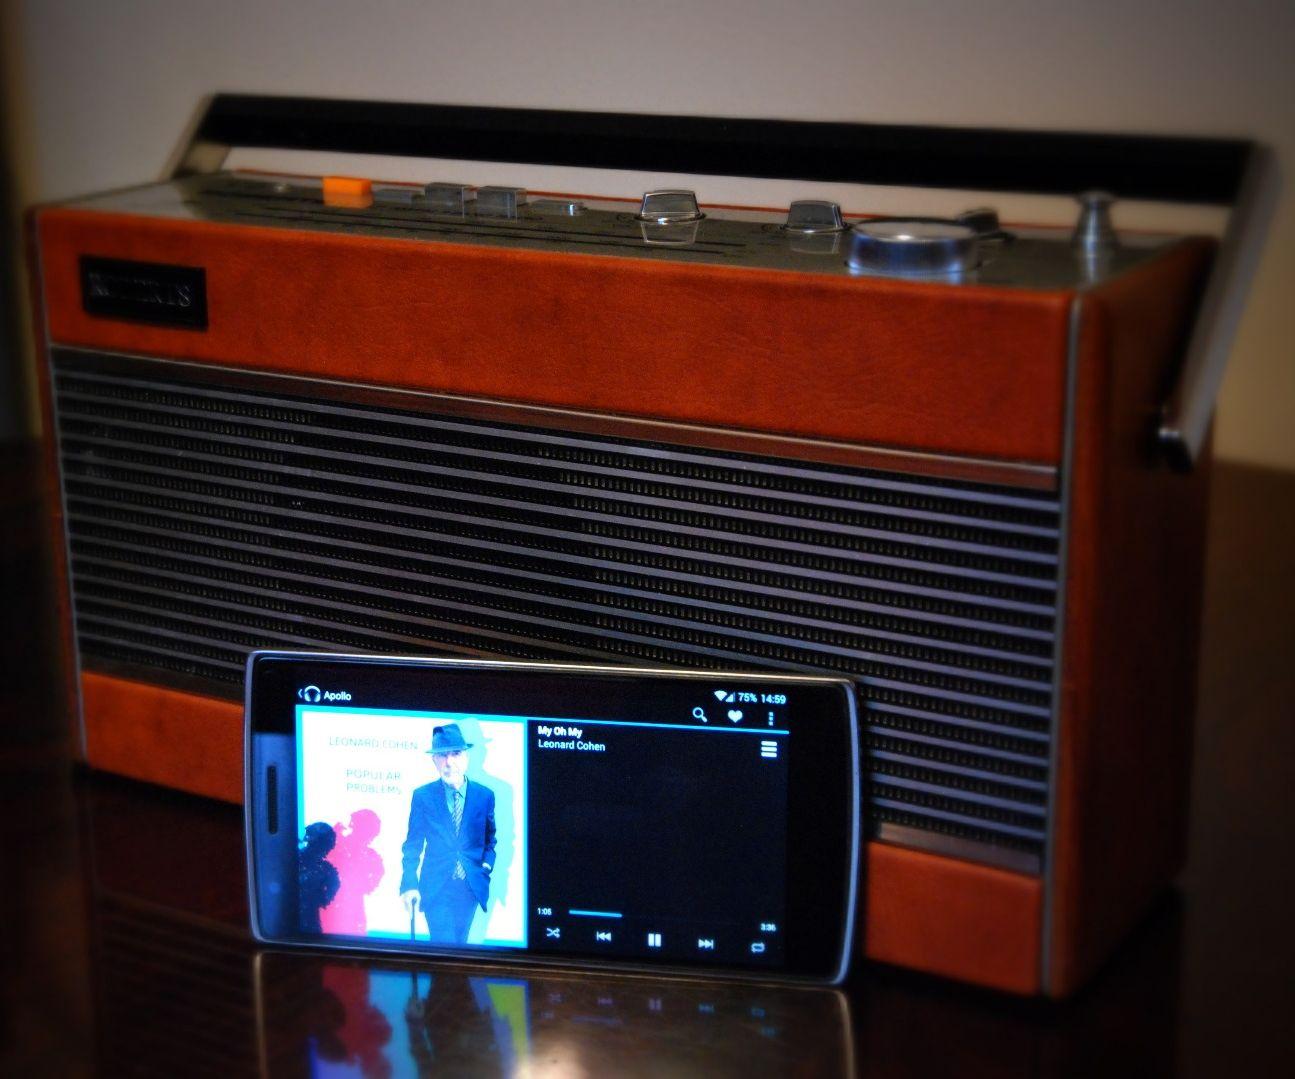 Roberts 747 - DIY Raspberry Pi internet radio/streamer